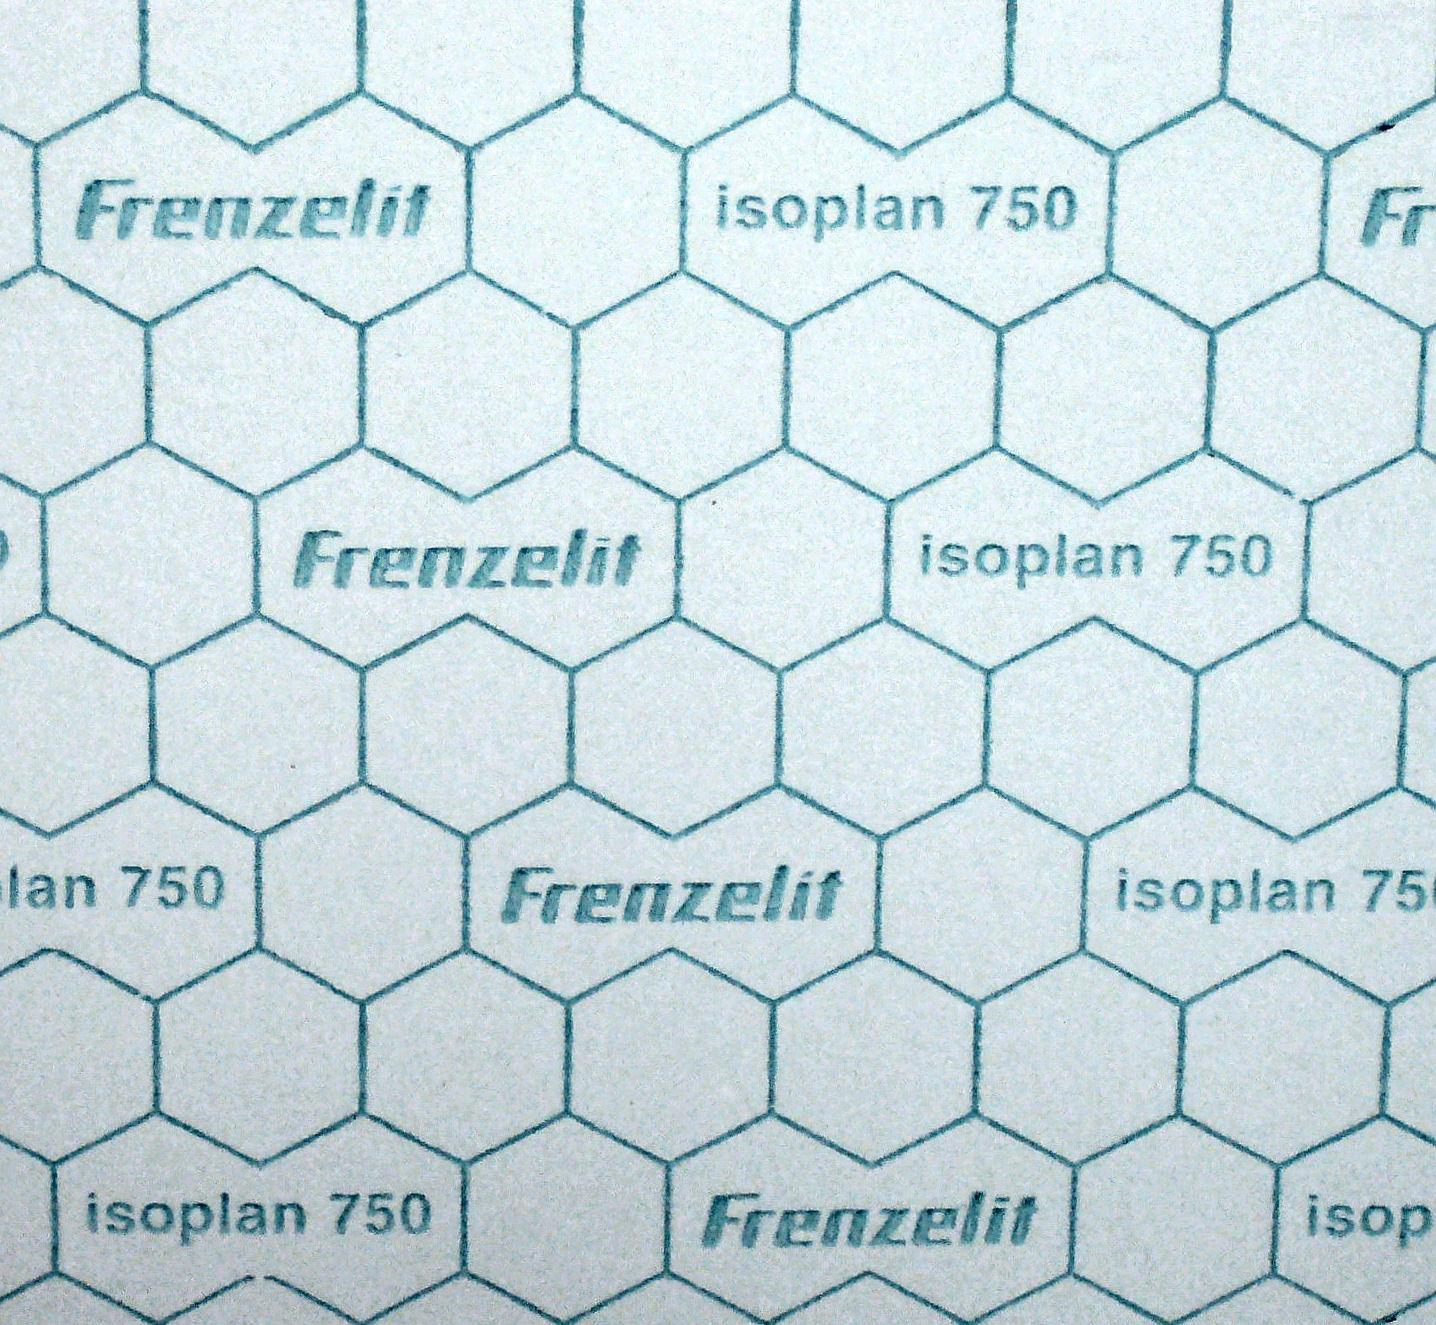 Frenzelit Isoplan 750